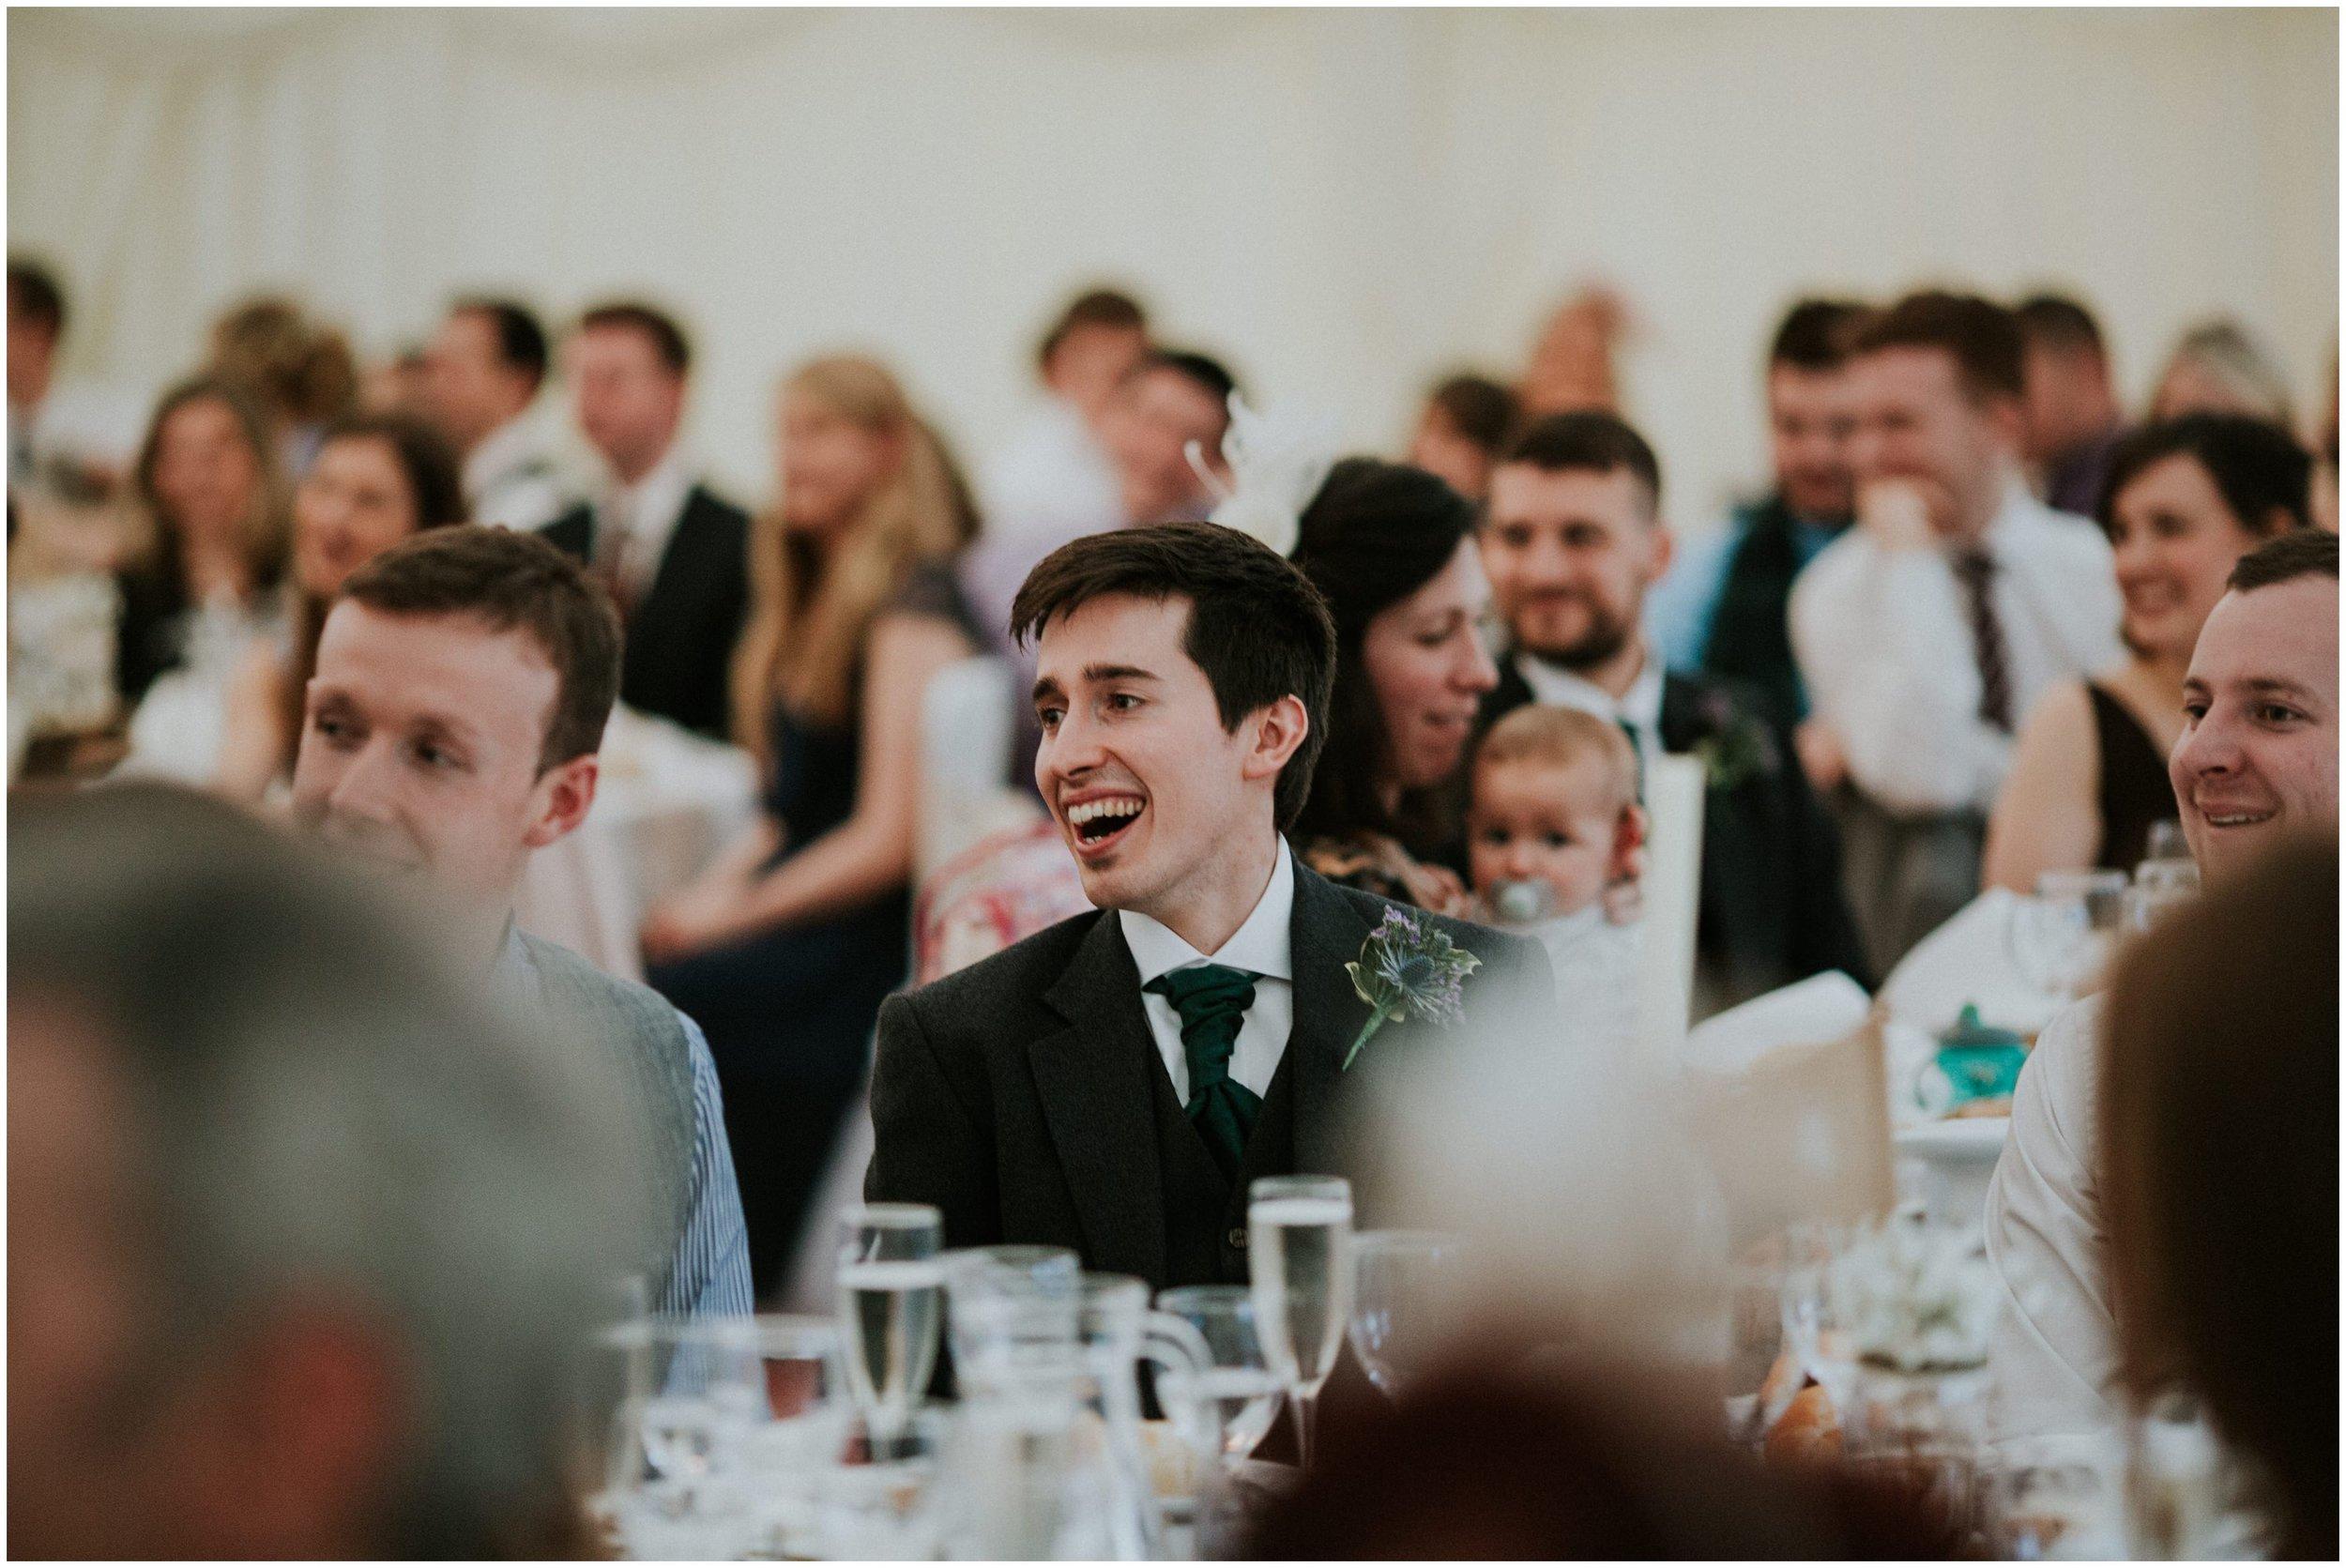 Photography 78 - Glasgow Wedding Photographer - Dave & Alana_0085.jpg